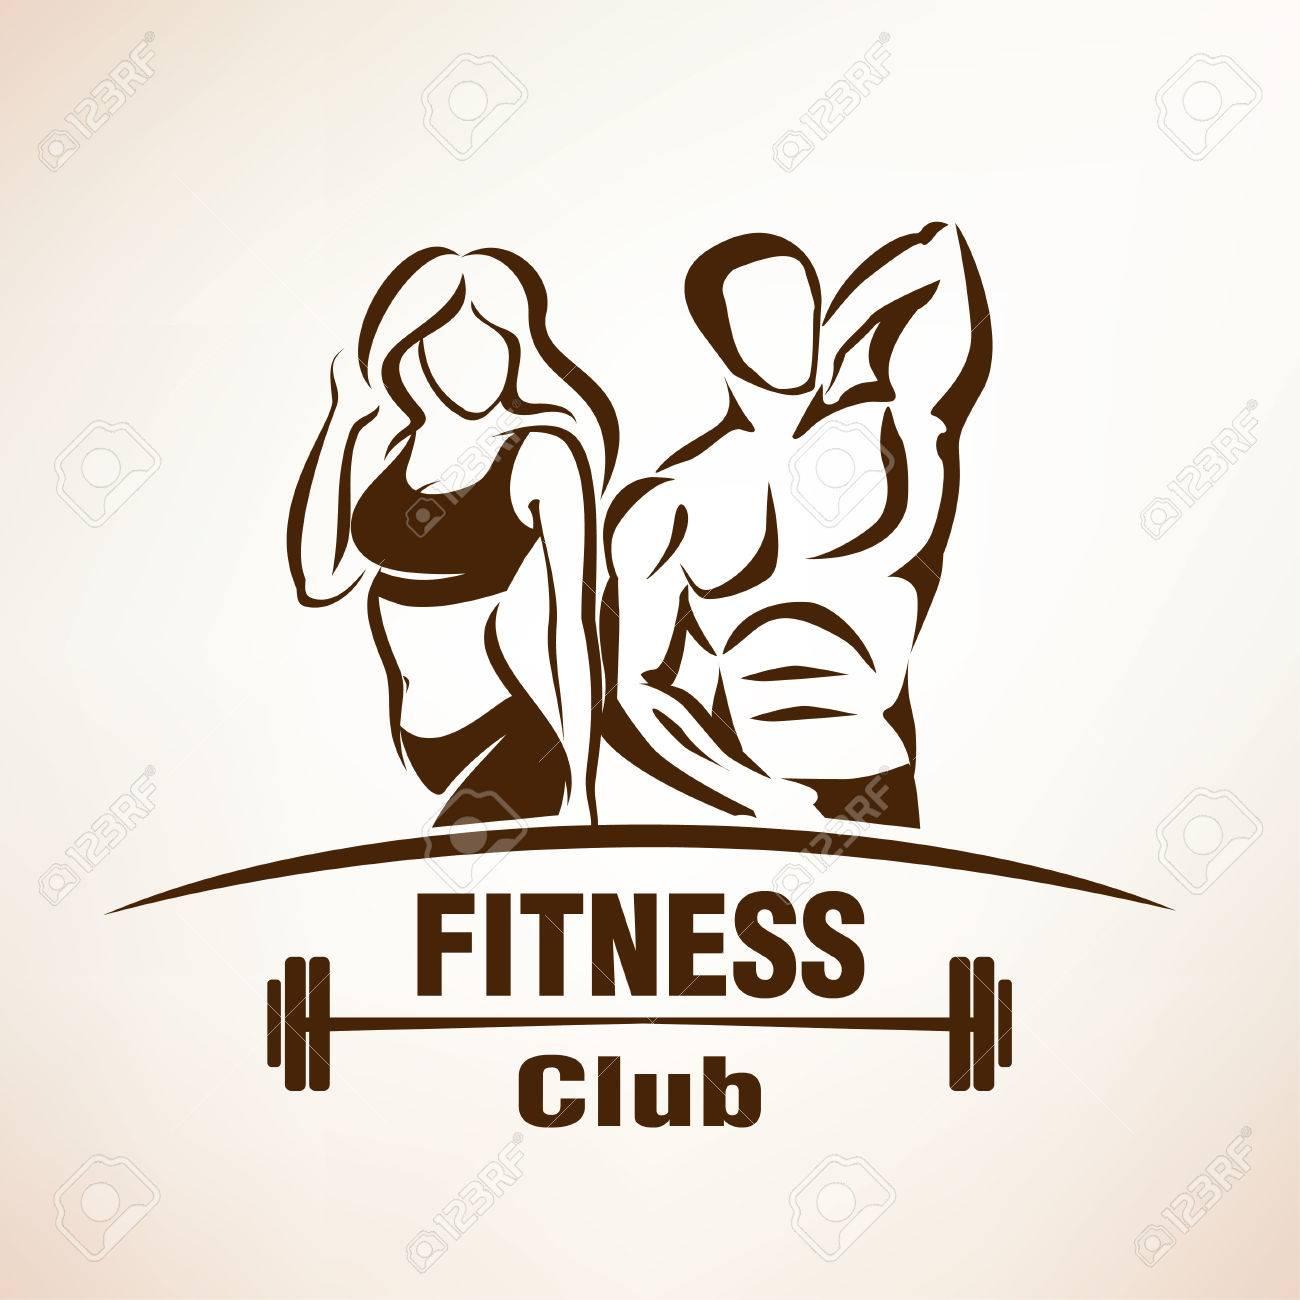 Símbolo De Fitness, Boceto Esbozado, Emblema O Plantilla De Etiqueta ...